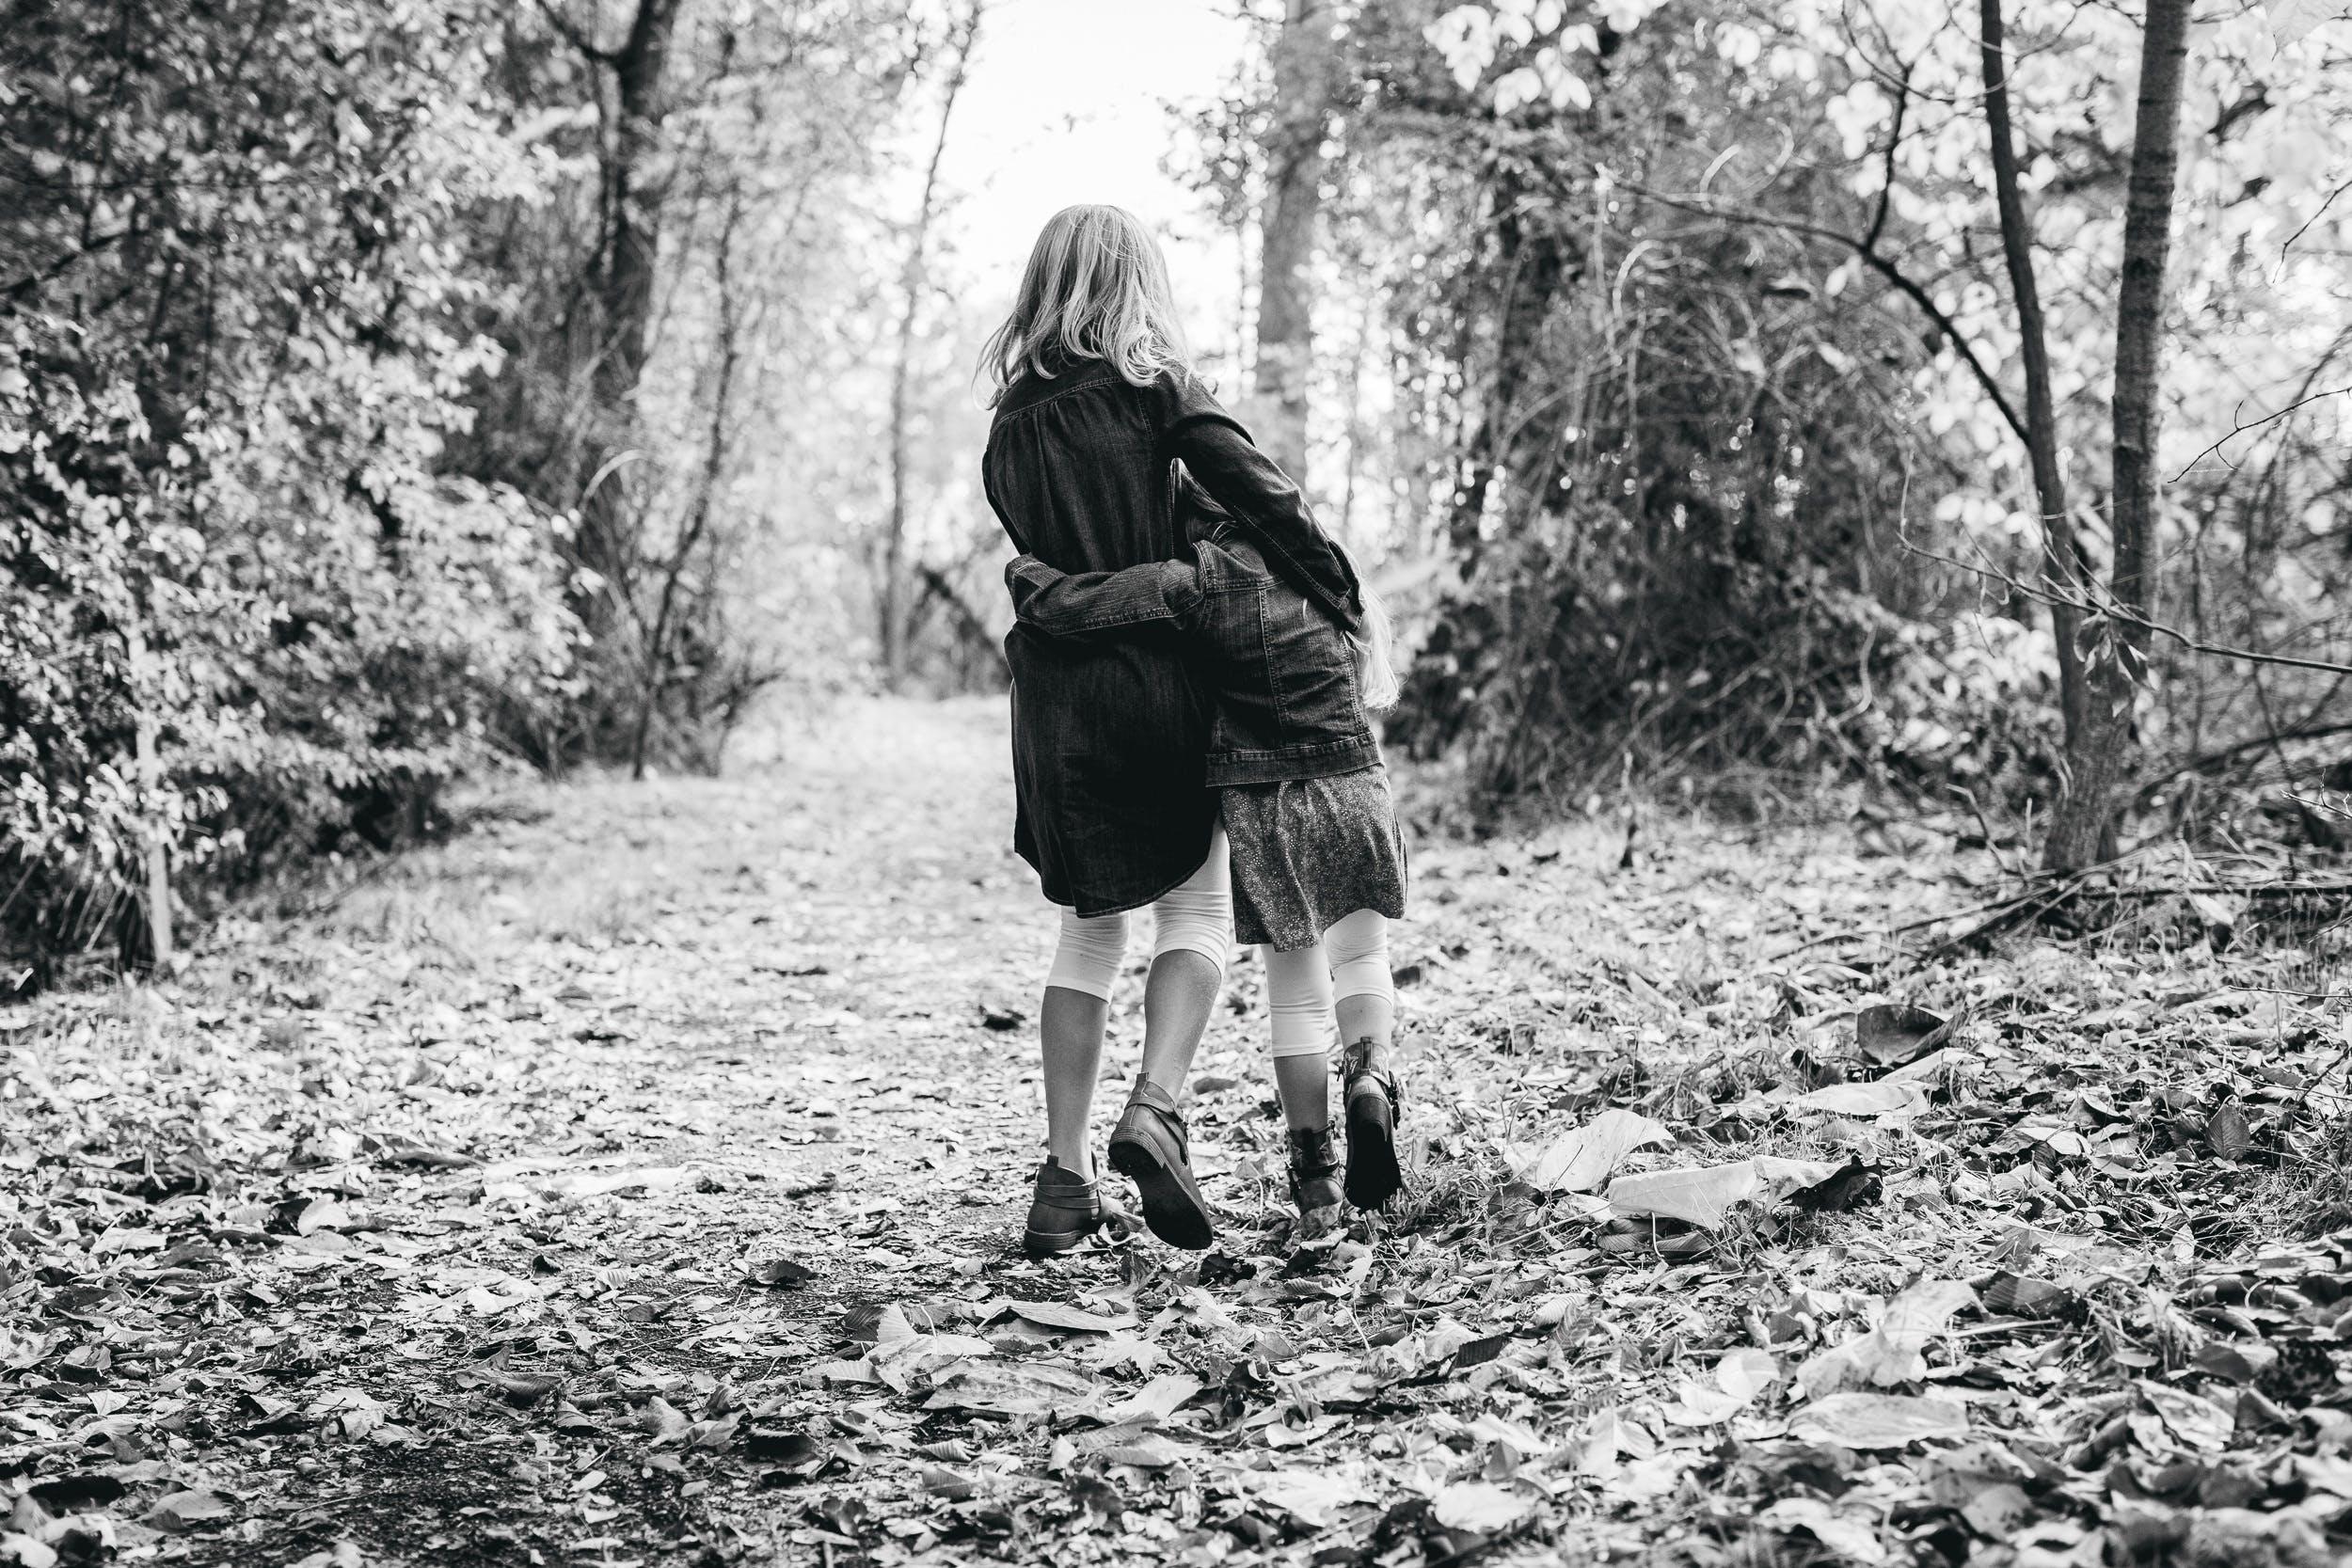 black-and-white, childhood, children